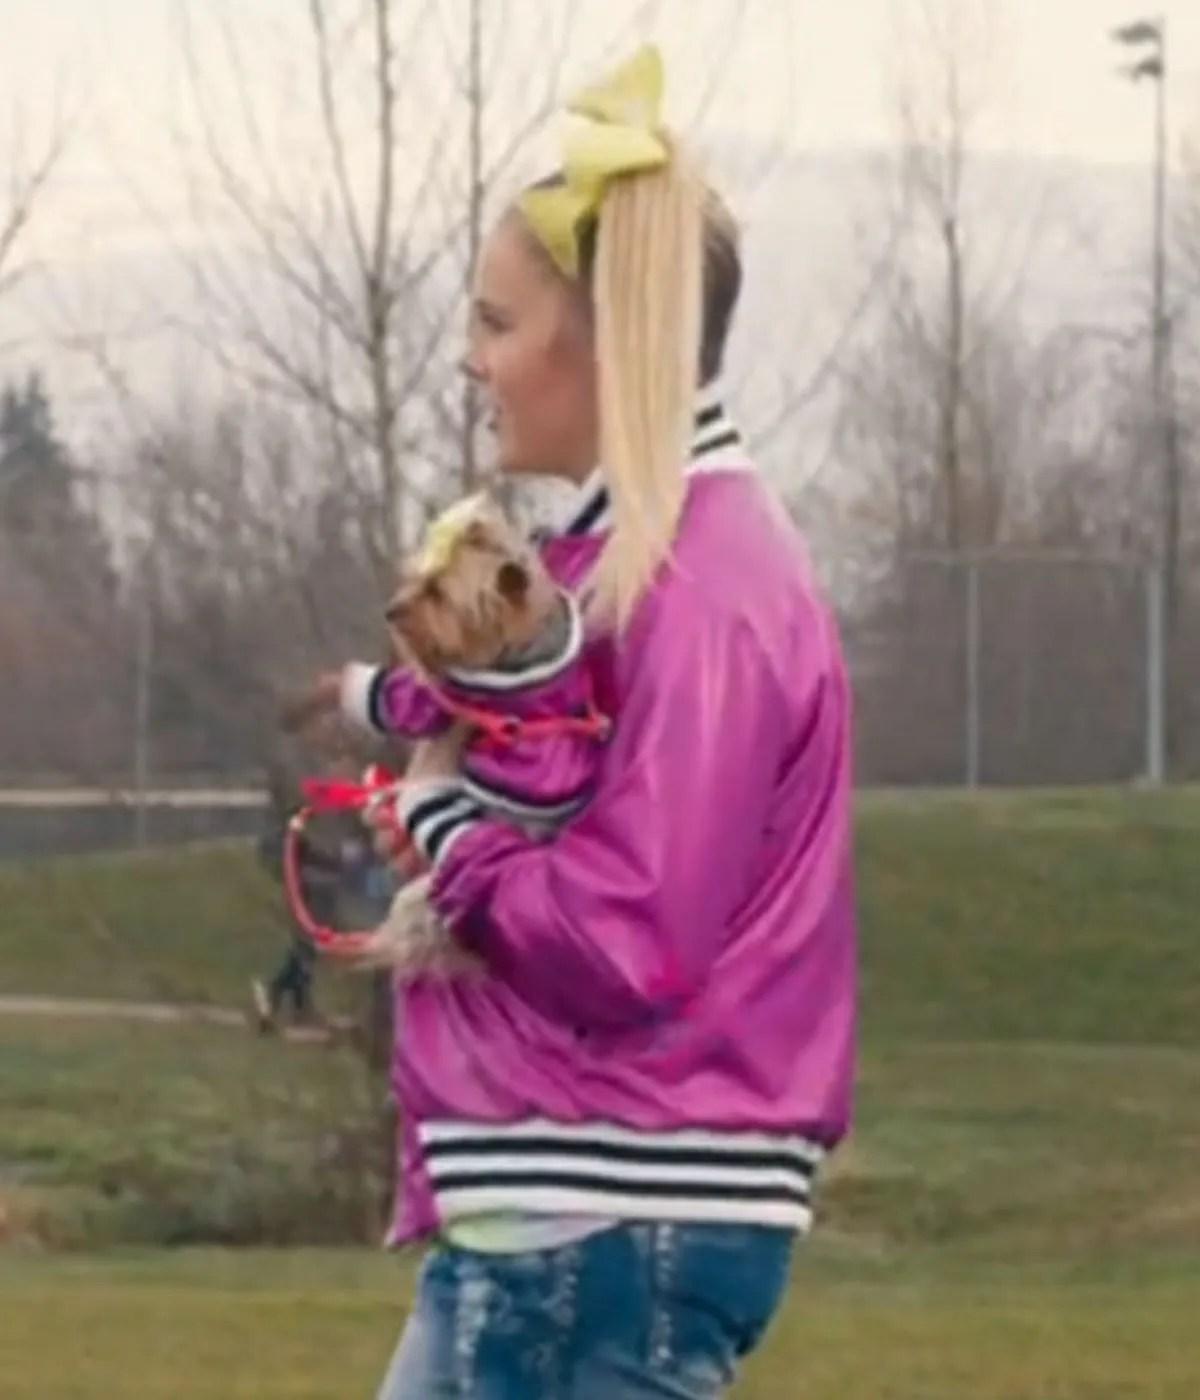 the-j-team-jojo-siwa-pink-jacket